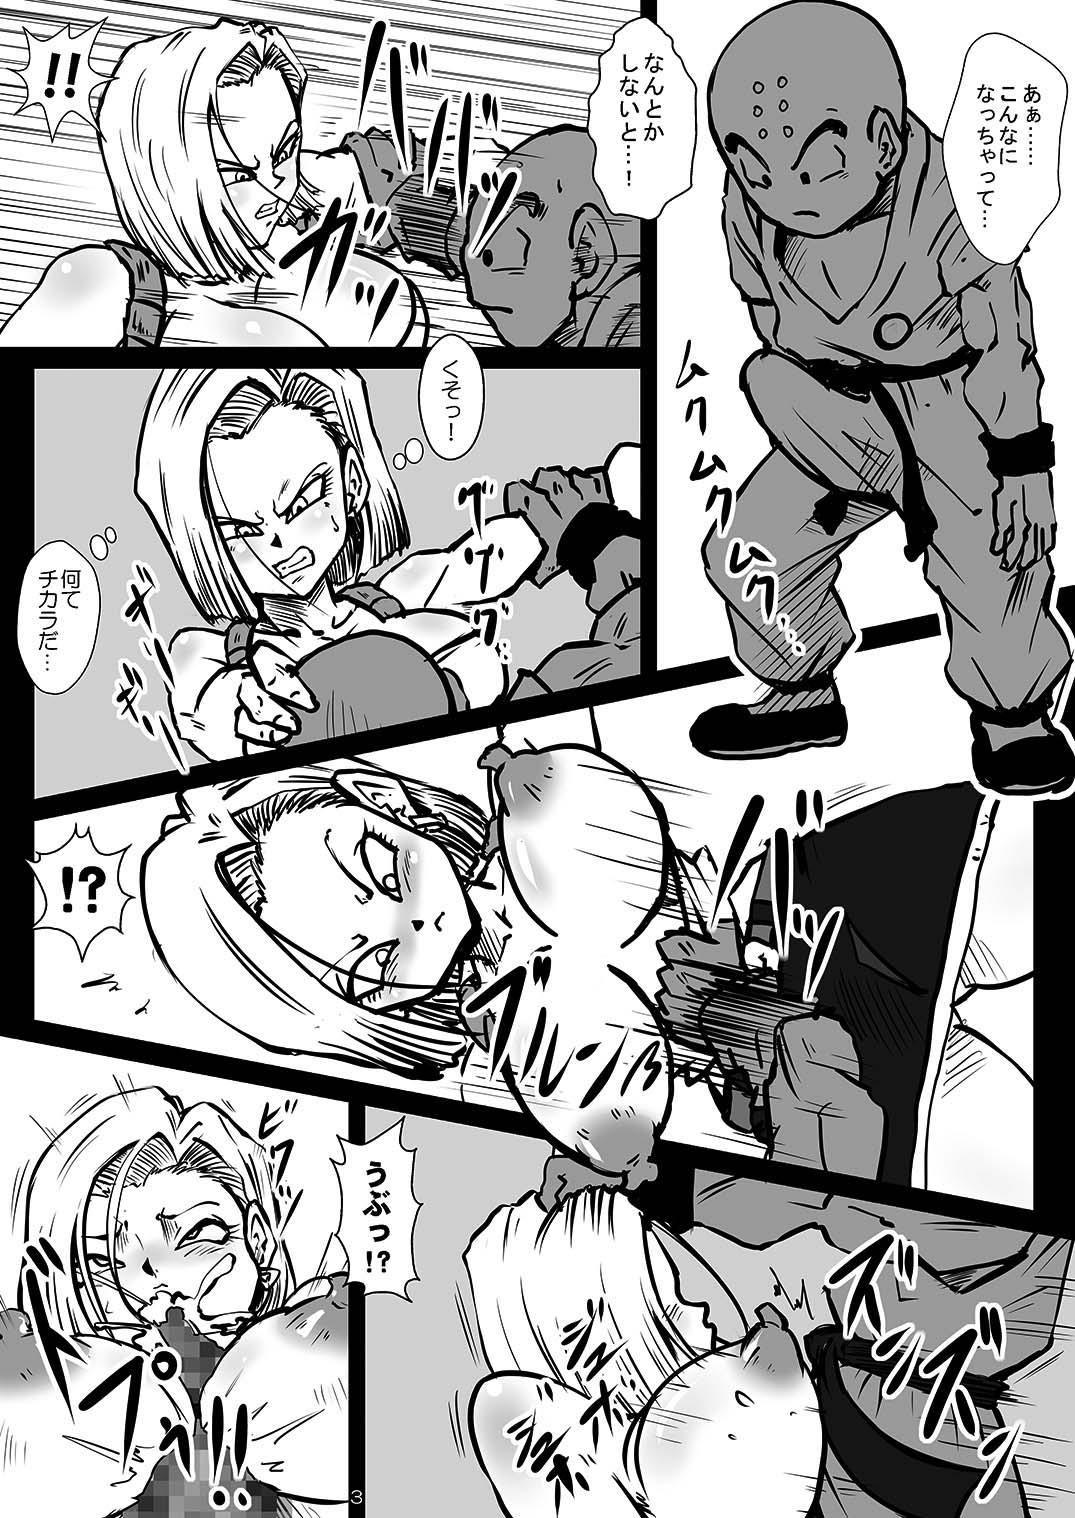 Tensei Shitara Raccoon City Datta Ken 2